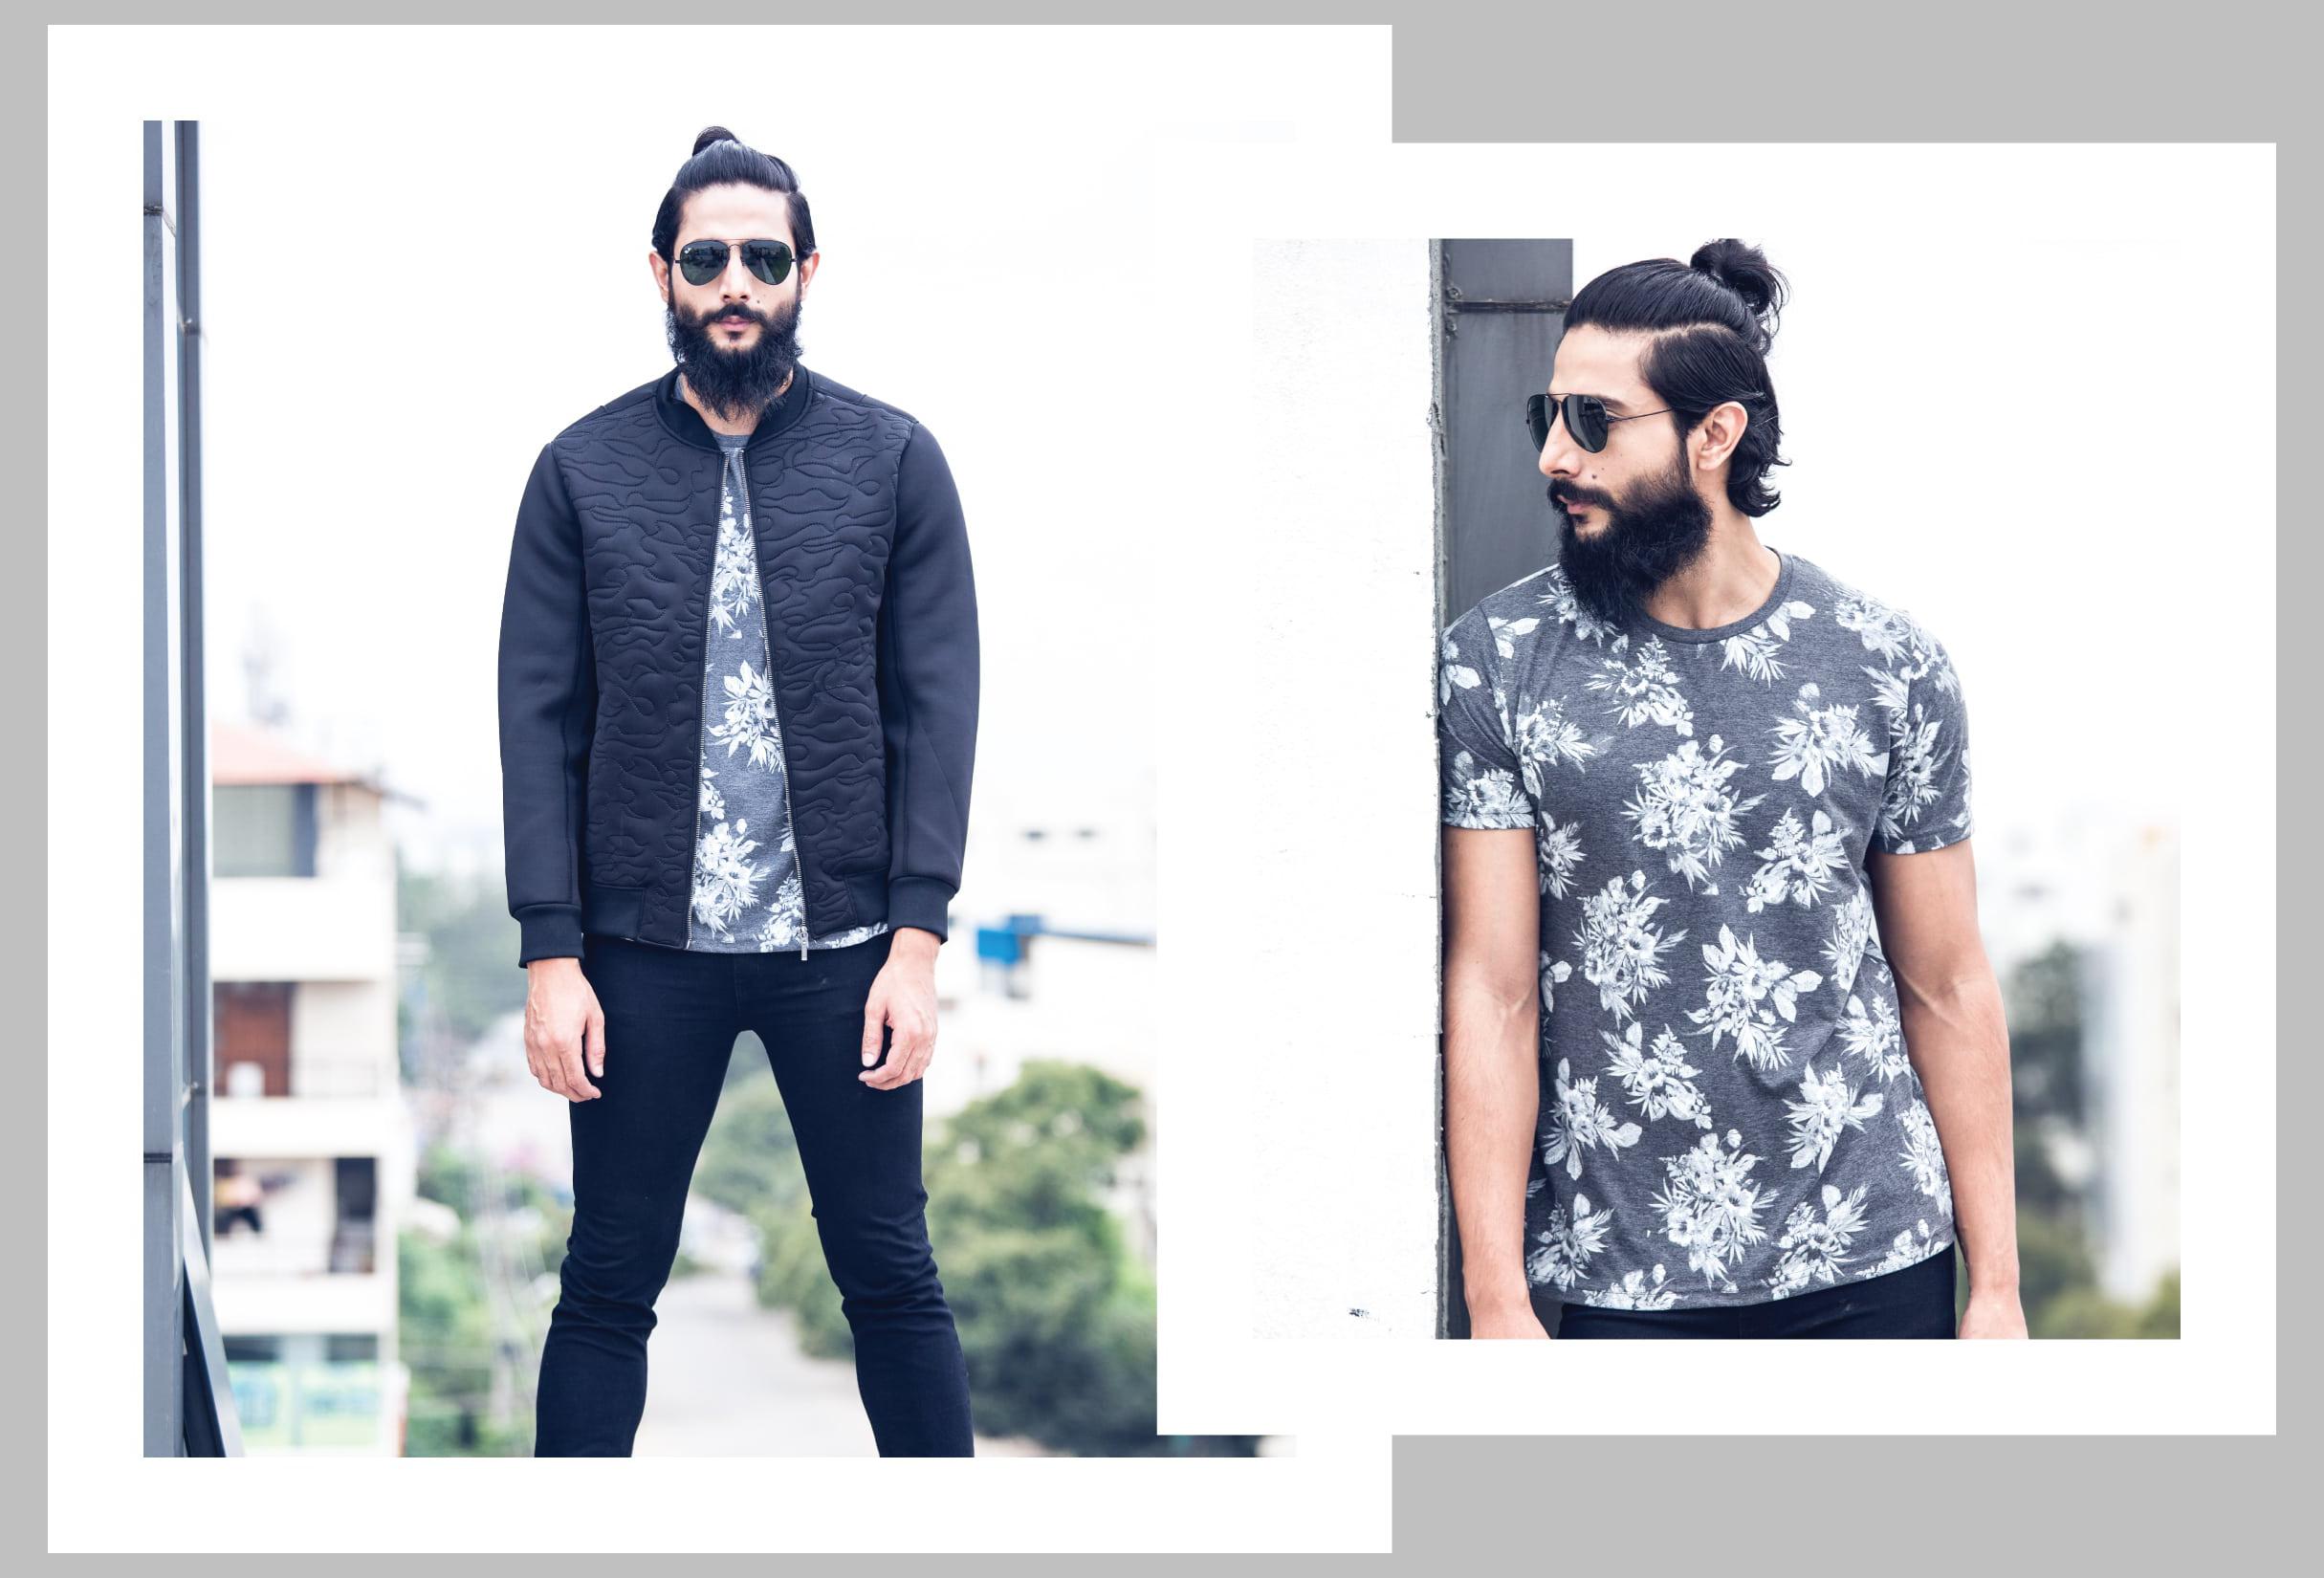 Kamaljeet_Rana_Floral_Prints_Sporty_Jacket_Fashion_Style